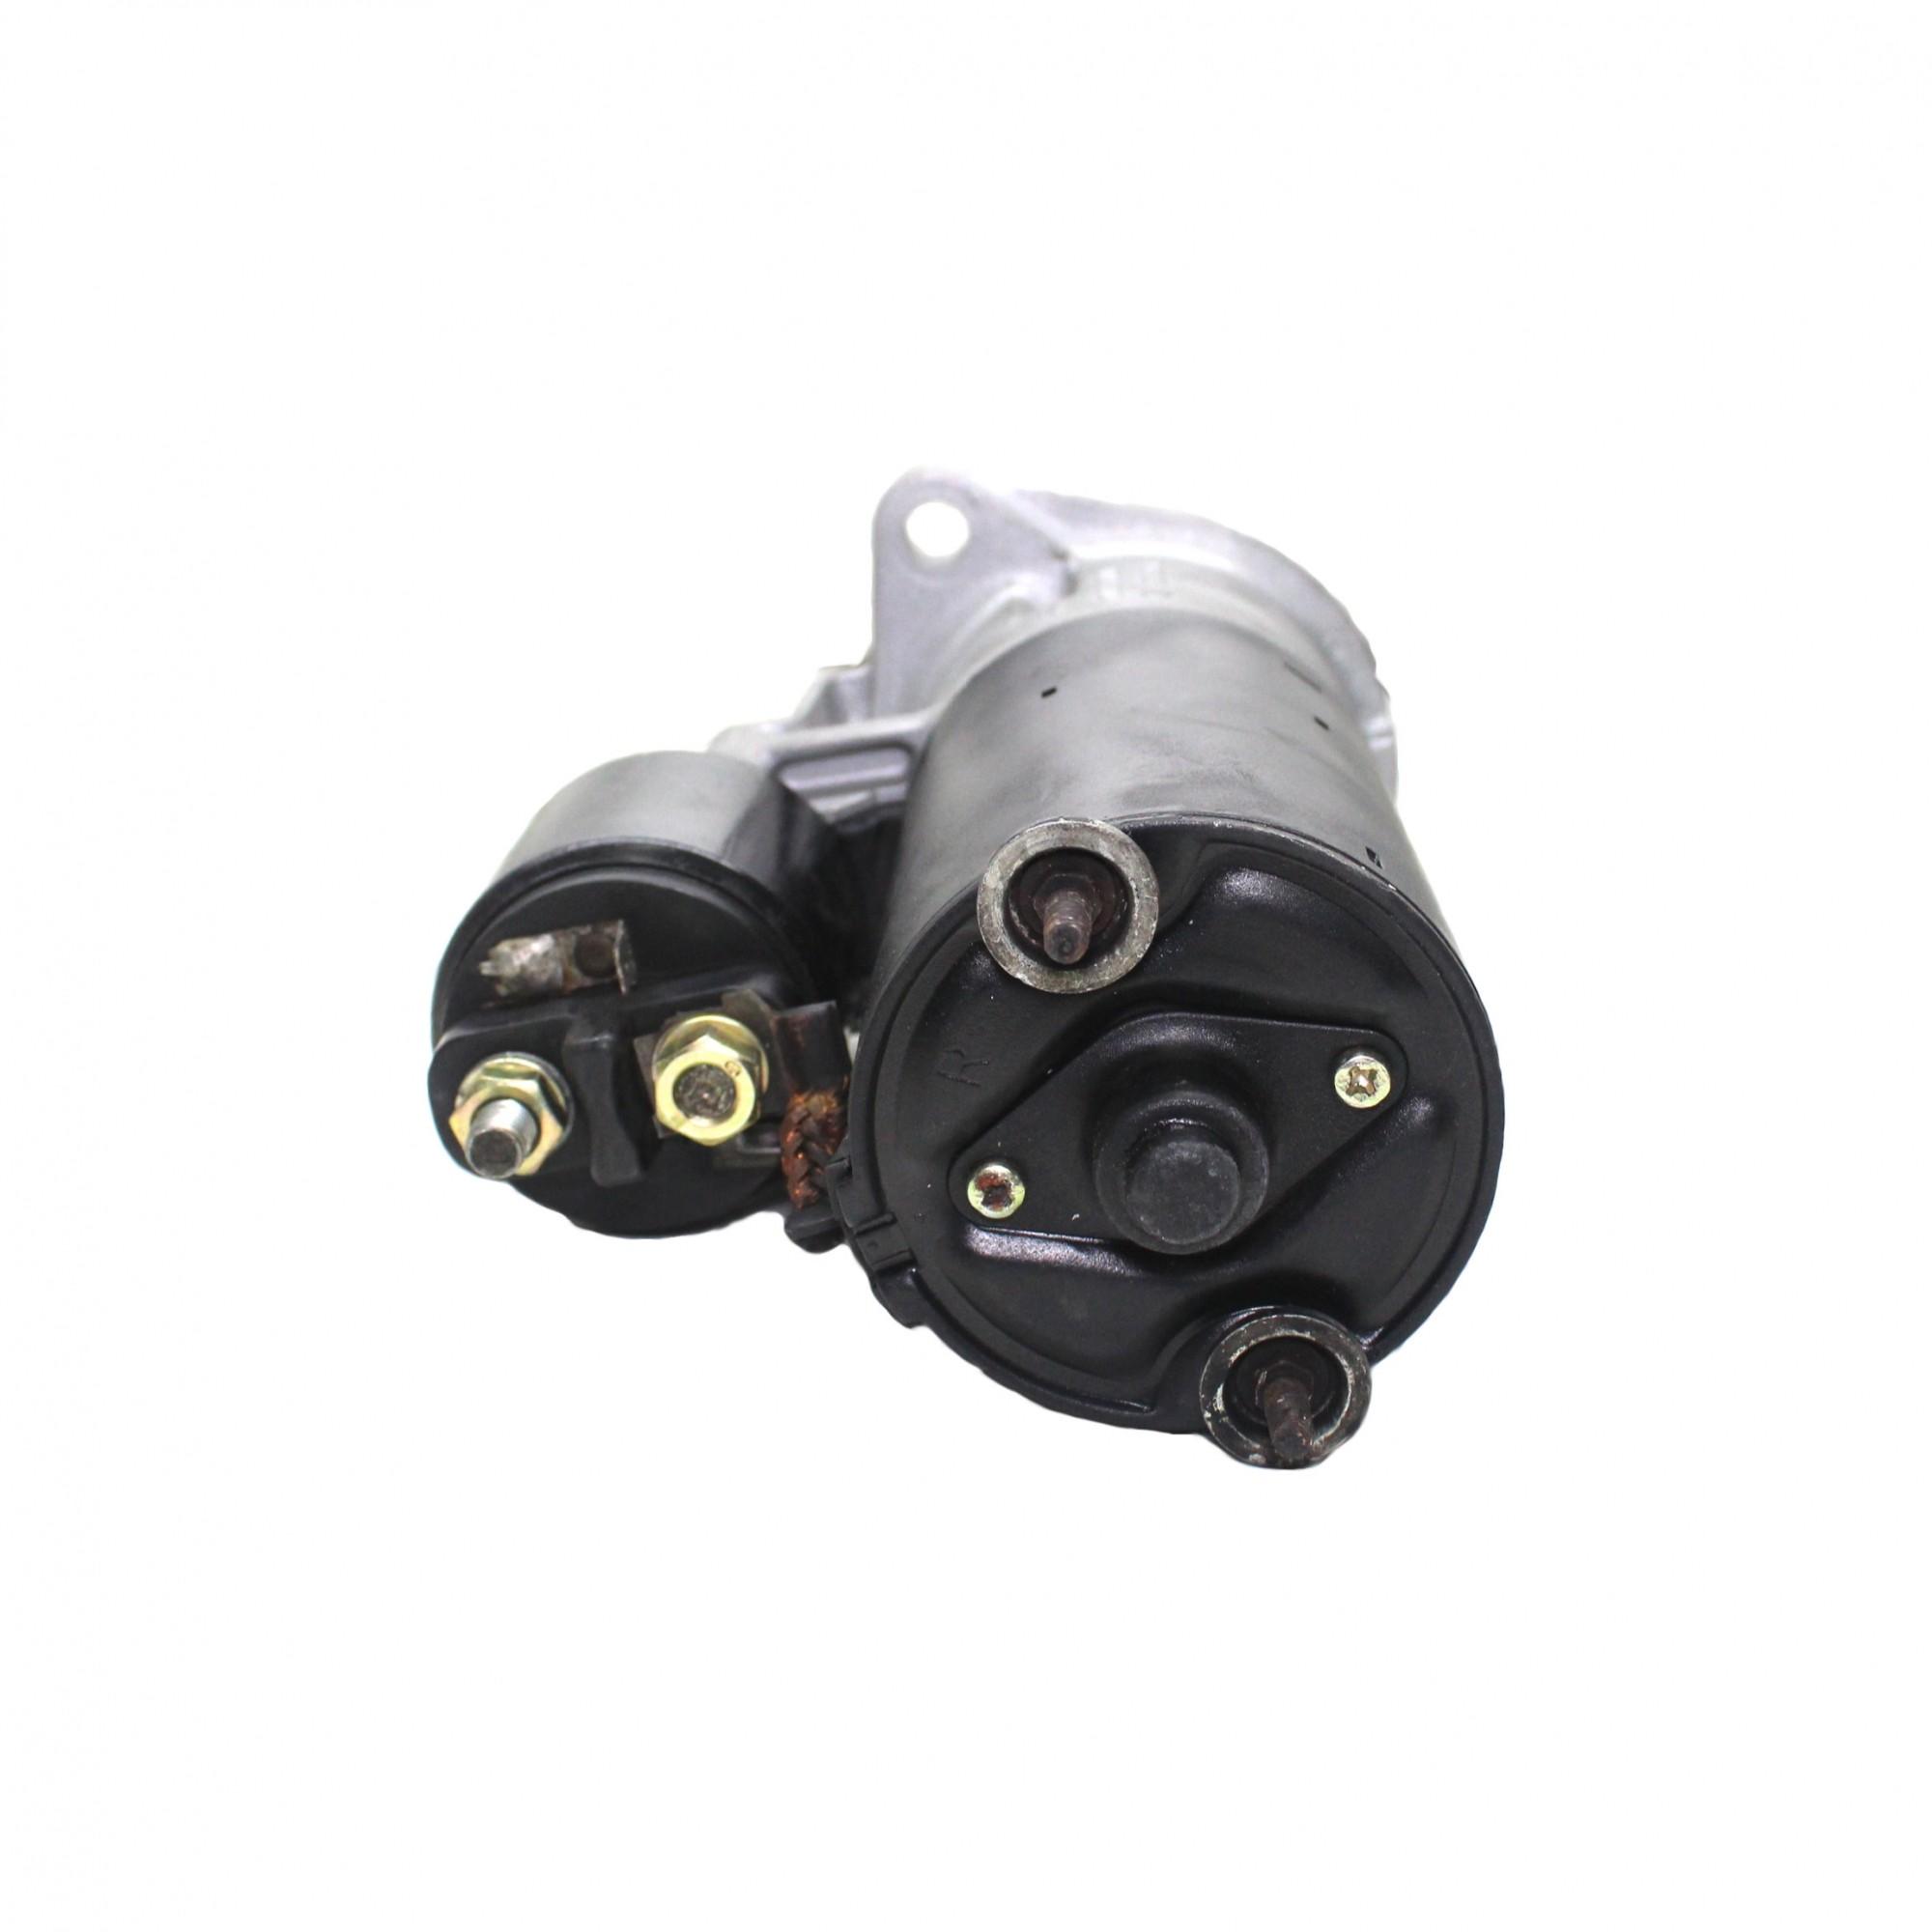 Motor de Arranque Partida Bosch Alfa Romeo V6 164, 155, GTV 0001108048/ 0331303112-62